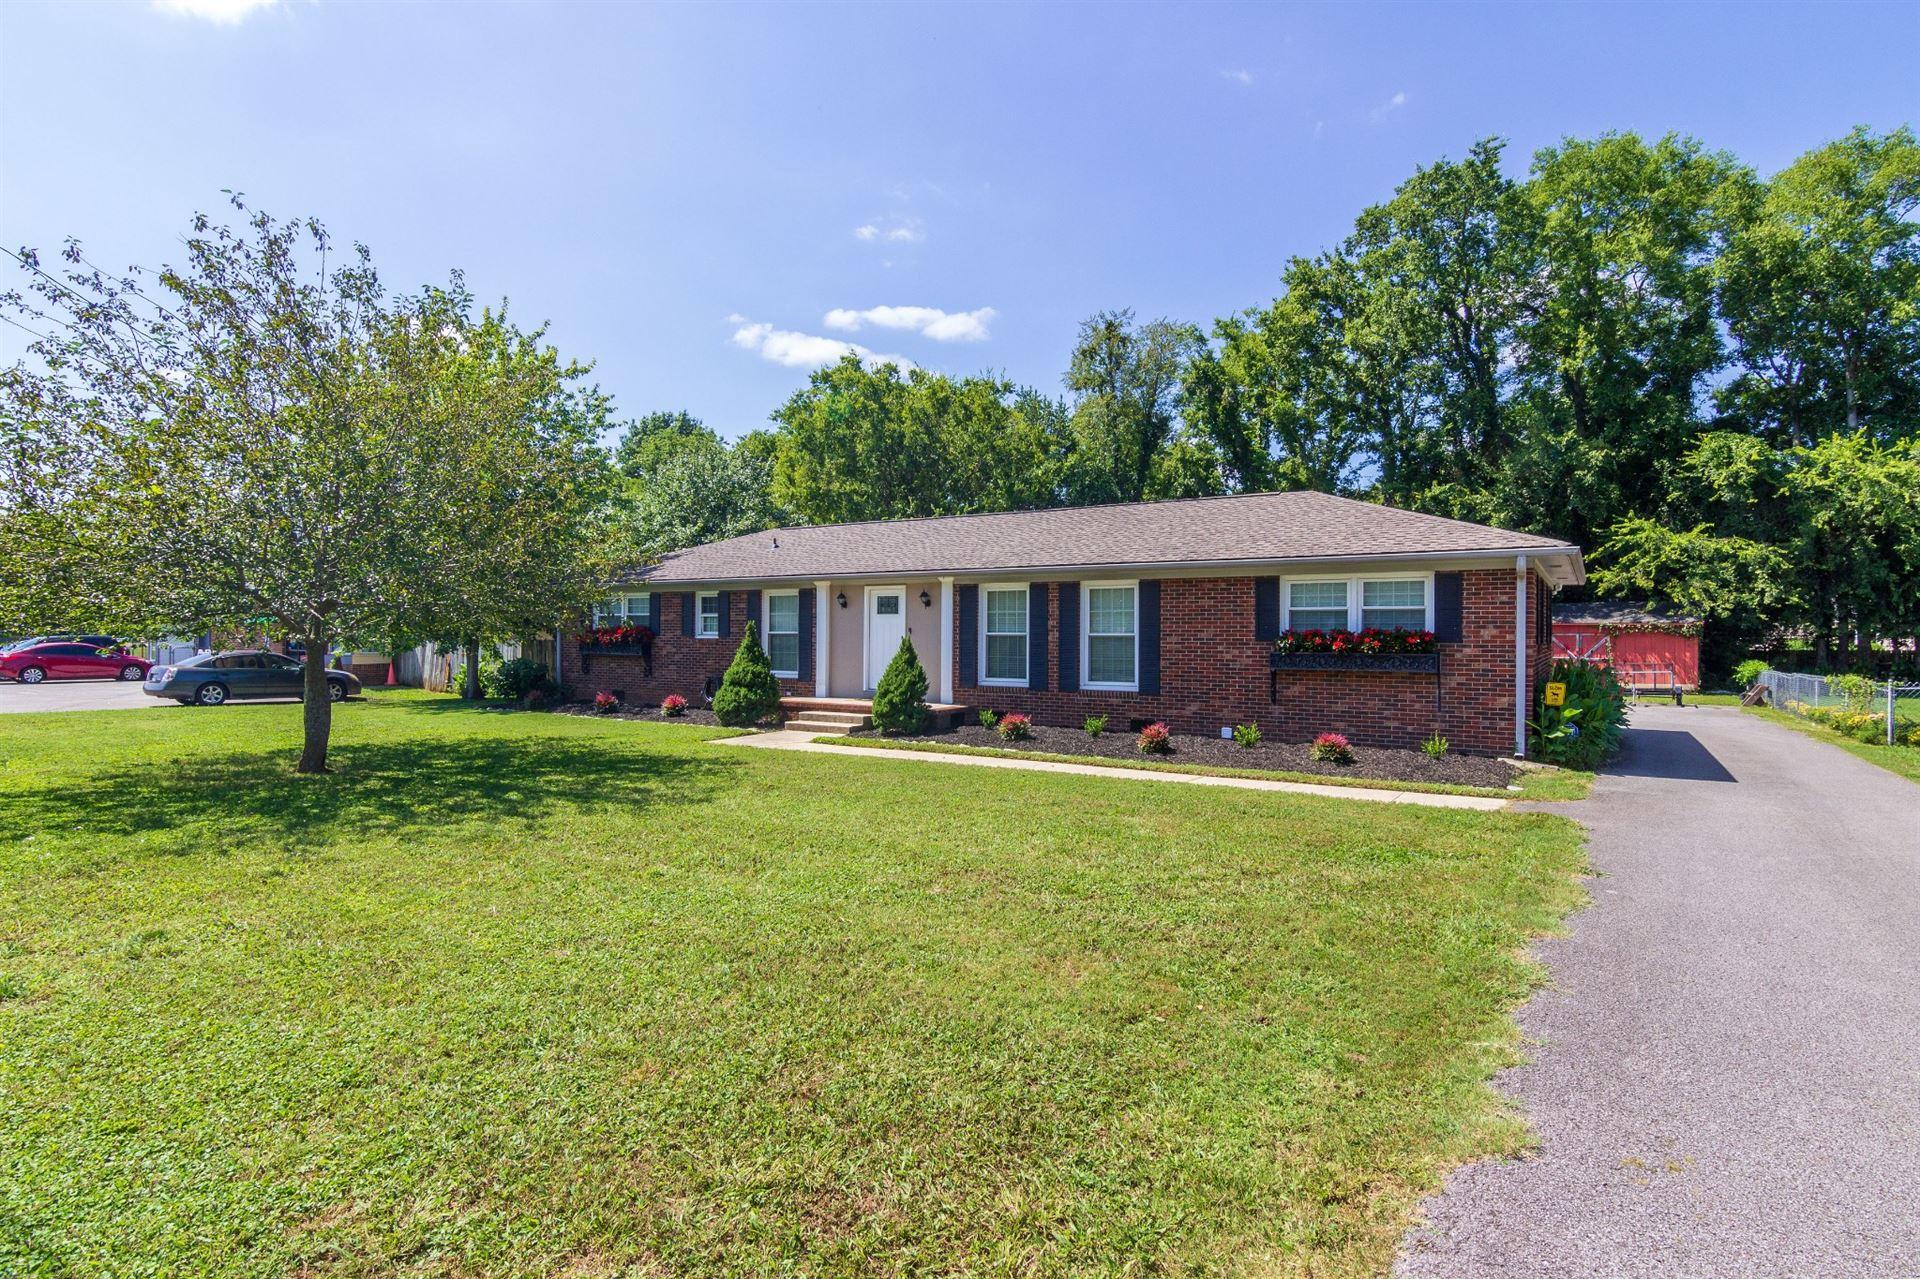 1214 Kirkwood Ave, Murfreesboro, TN 37130 - MLS#: 2289163